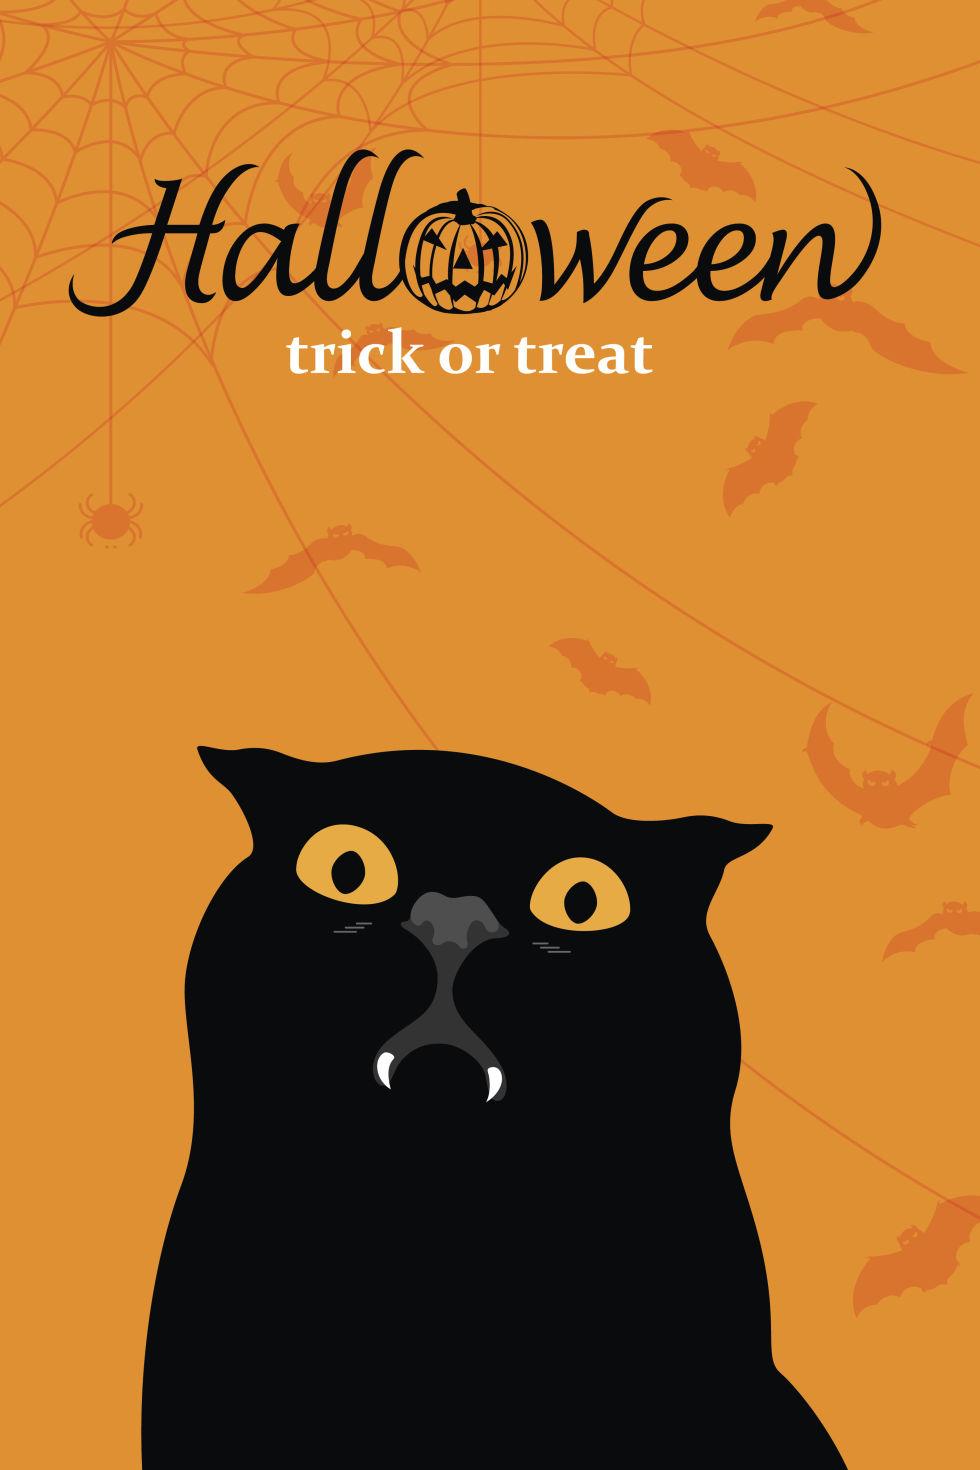 18 fun halloween trivia facts interesting halloween stats - Strange Halloween Facts